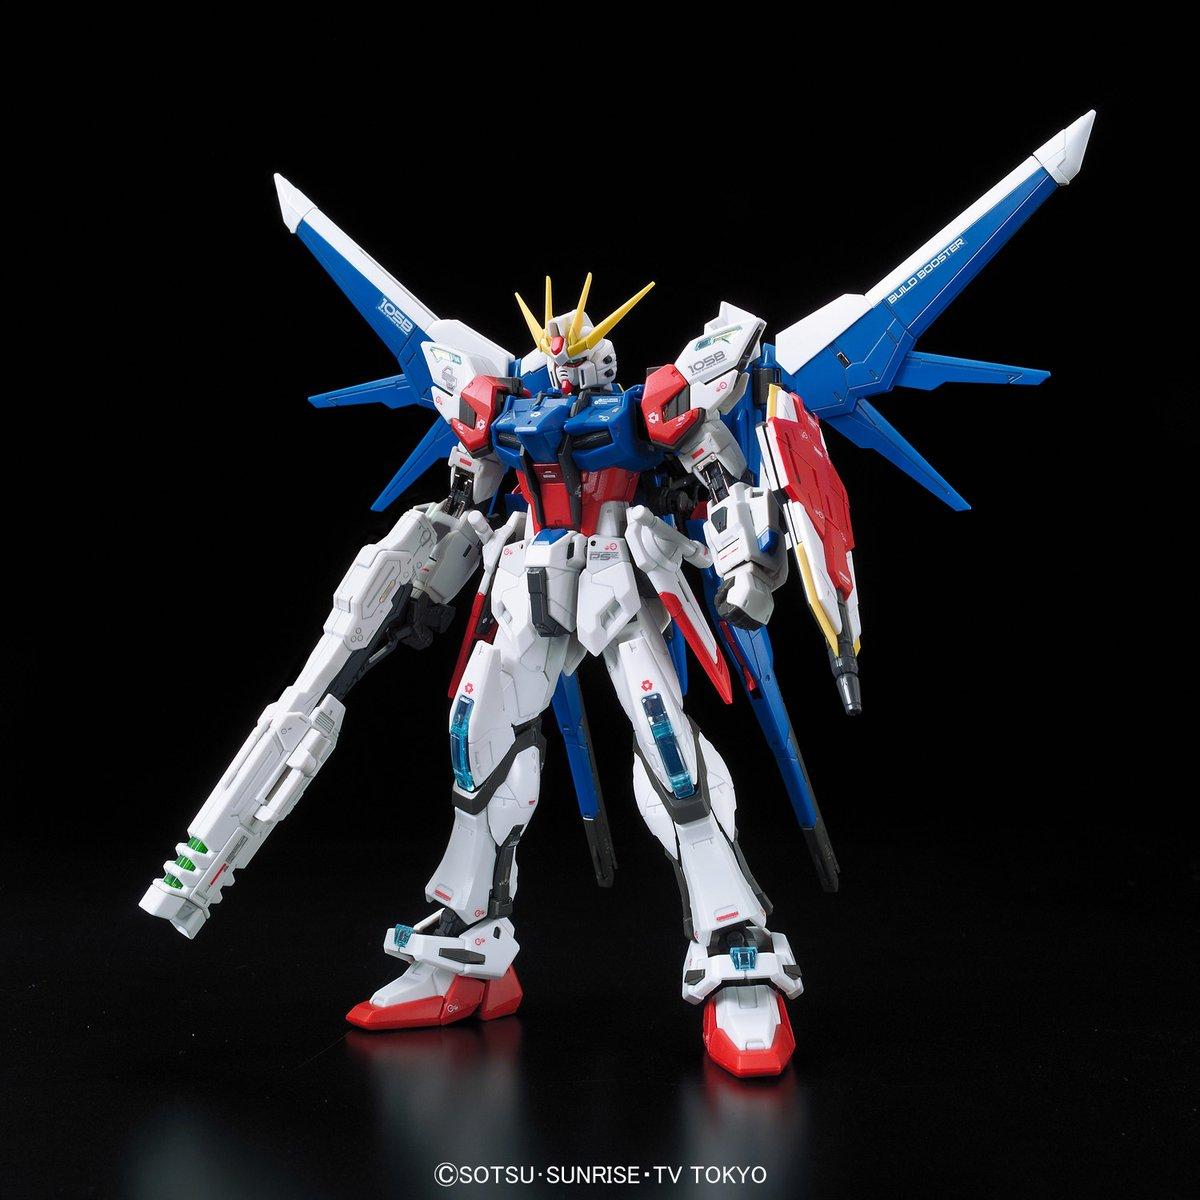 38045RG 1/144 GAT-X105B/FP ビルドストライクガンダムフルパッケージ [Build Strike Gundam Full Package] 0210510